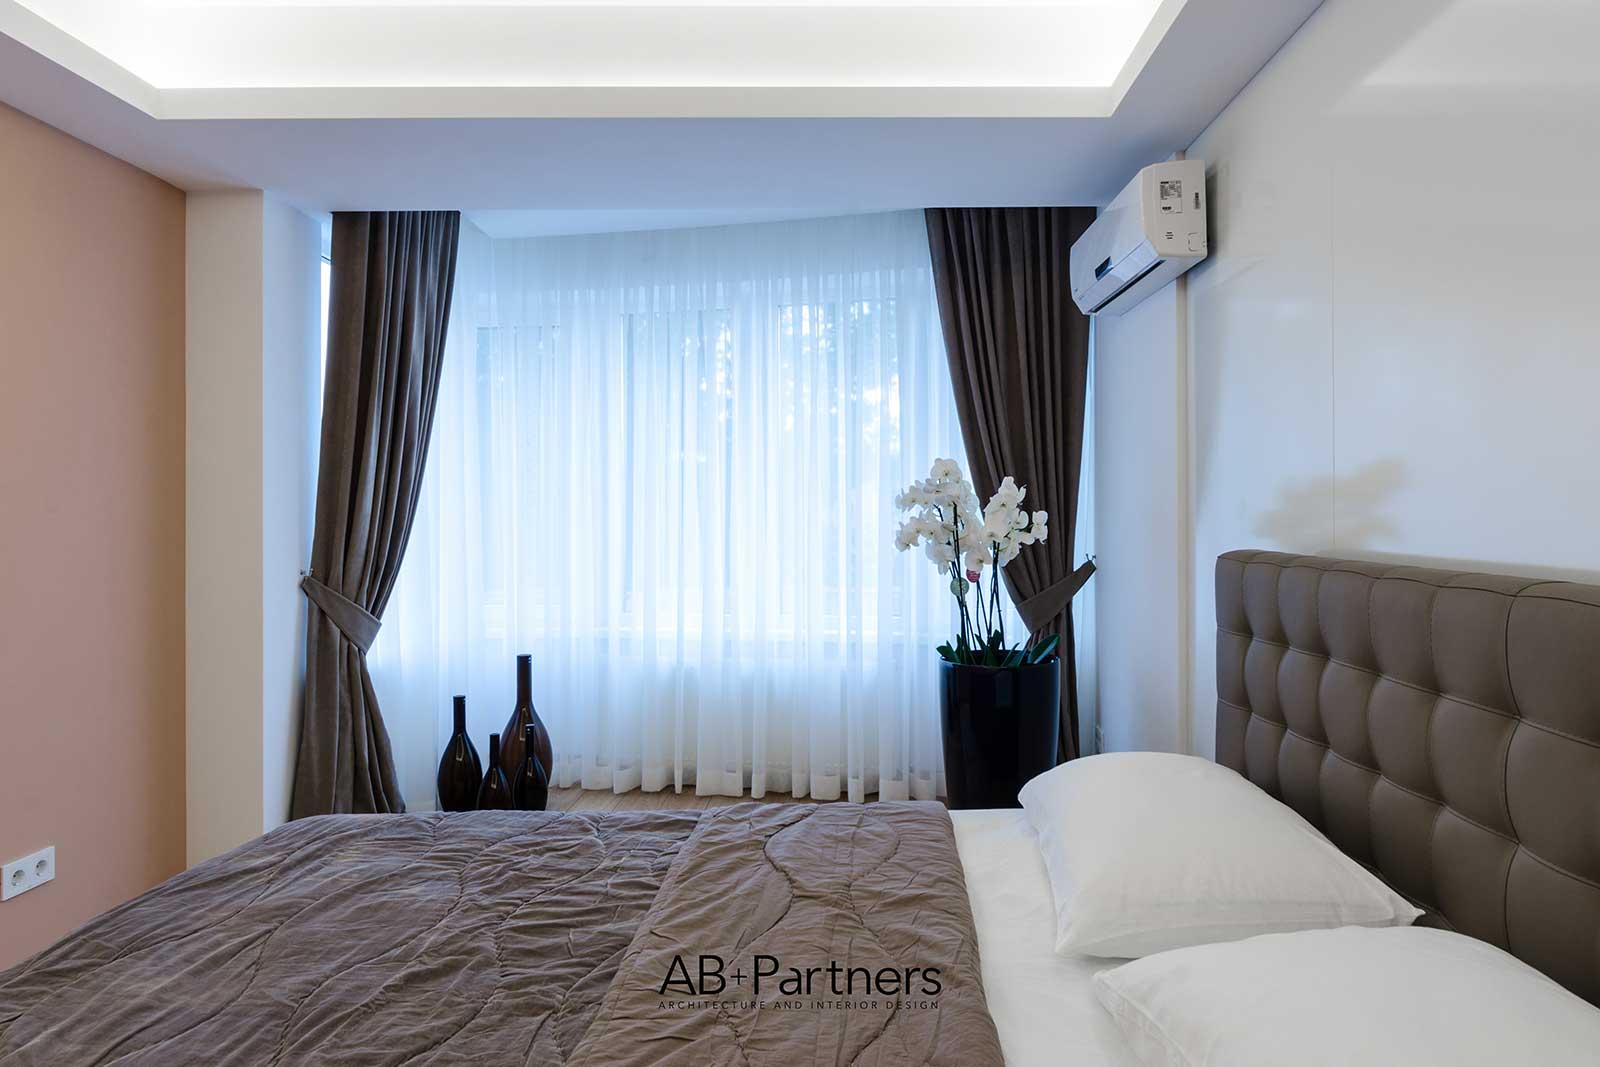 dormitory design standards